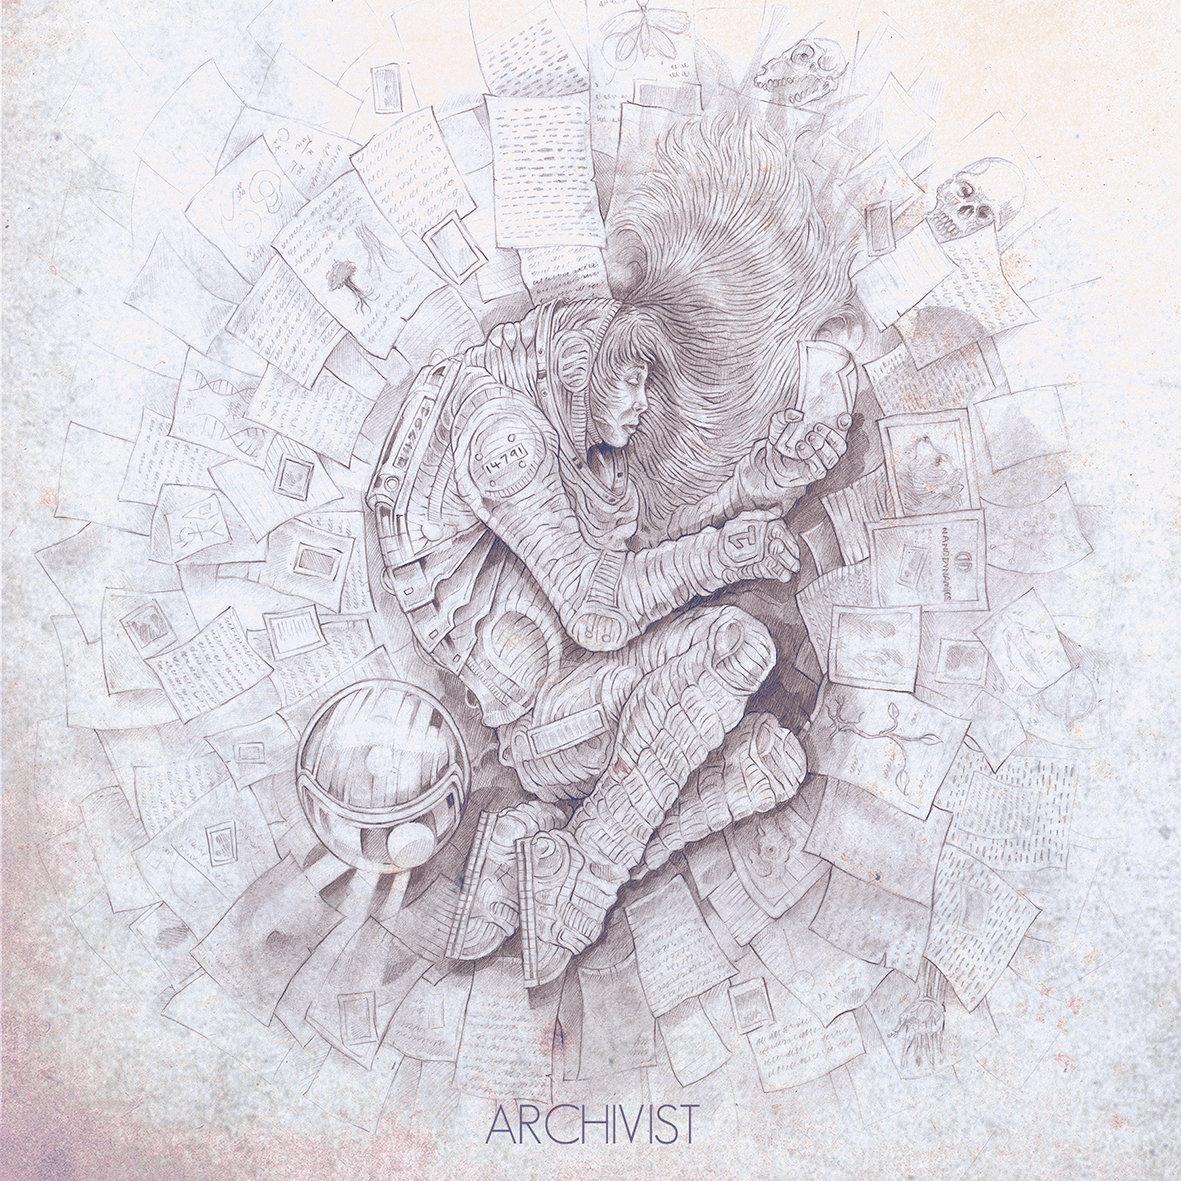 Best Of Bandcamp Free: Archivist - ARCHIVIST [Post Metal